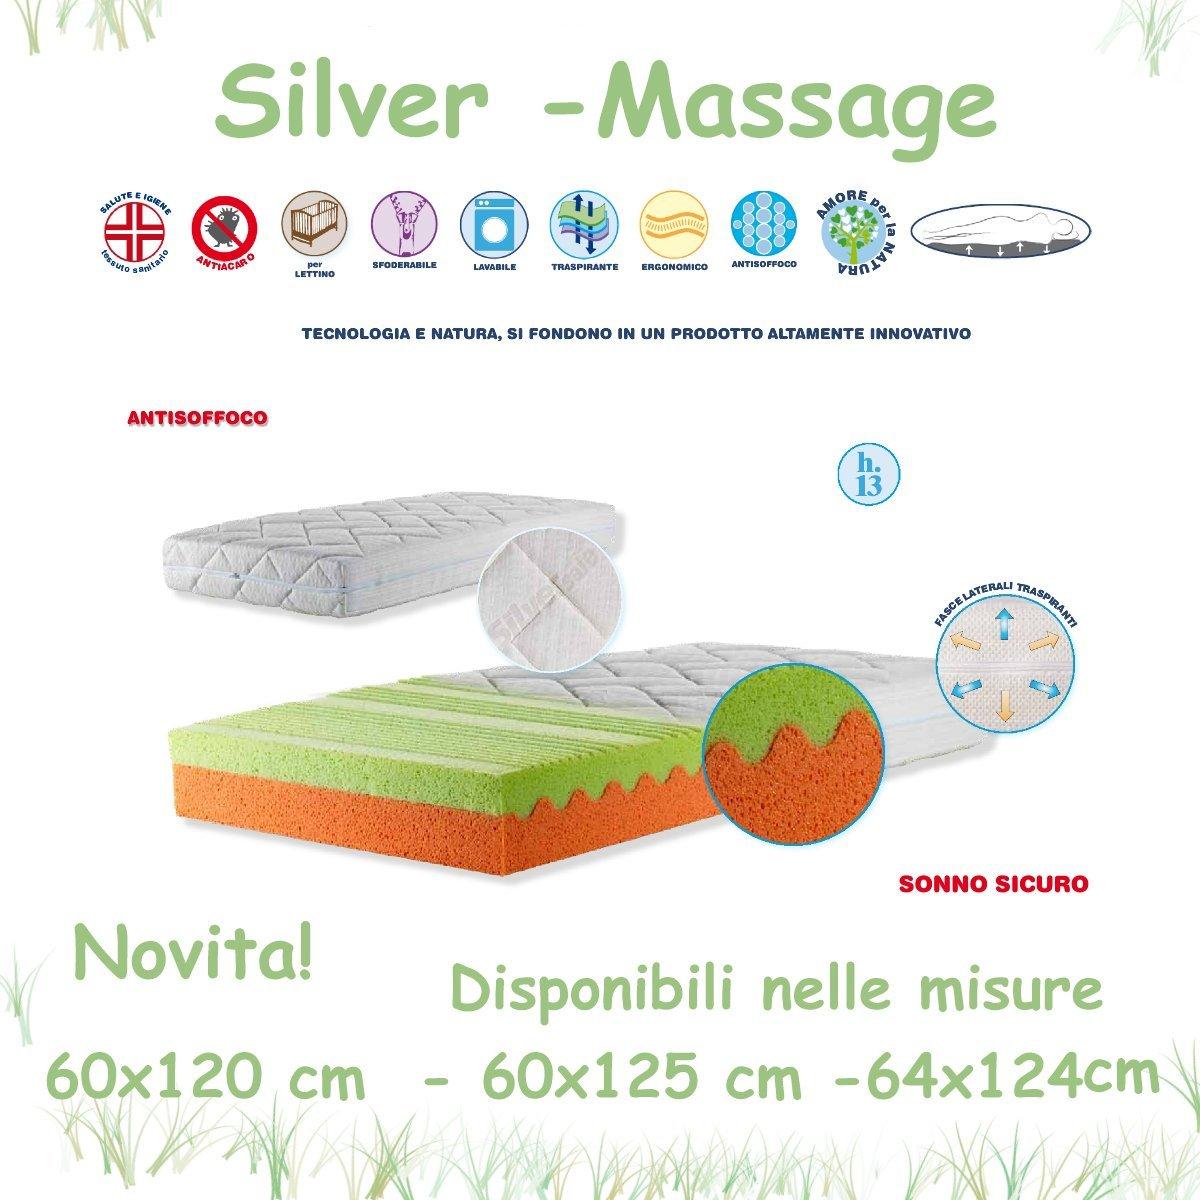 Colchón de Cuna Silver Massage Willy & Co. Alto 13 cm 64x124: Amazon.es: Bebé